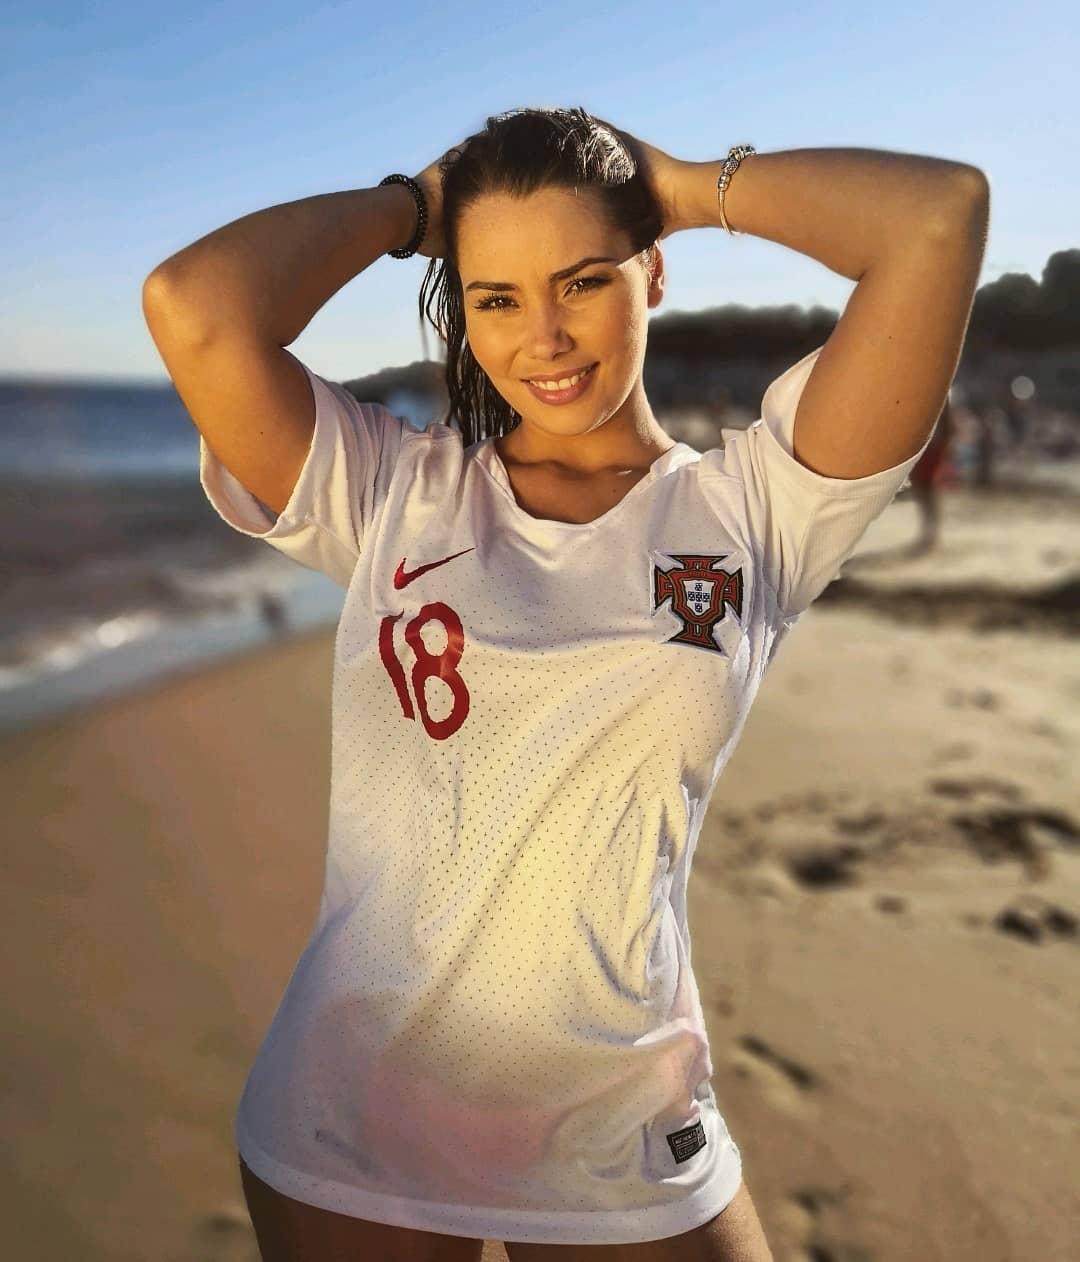 Margarida Aranha Love On Top Margarida Quer Ser Concorrente Do «Love On Top 7»